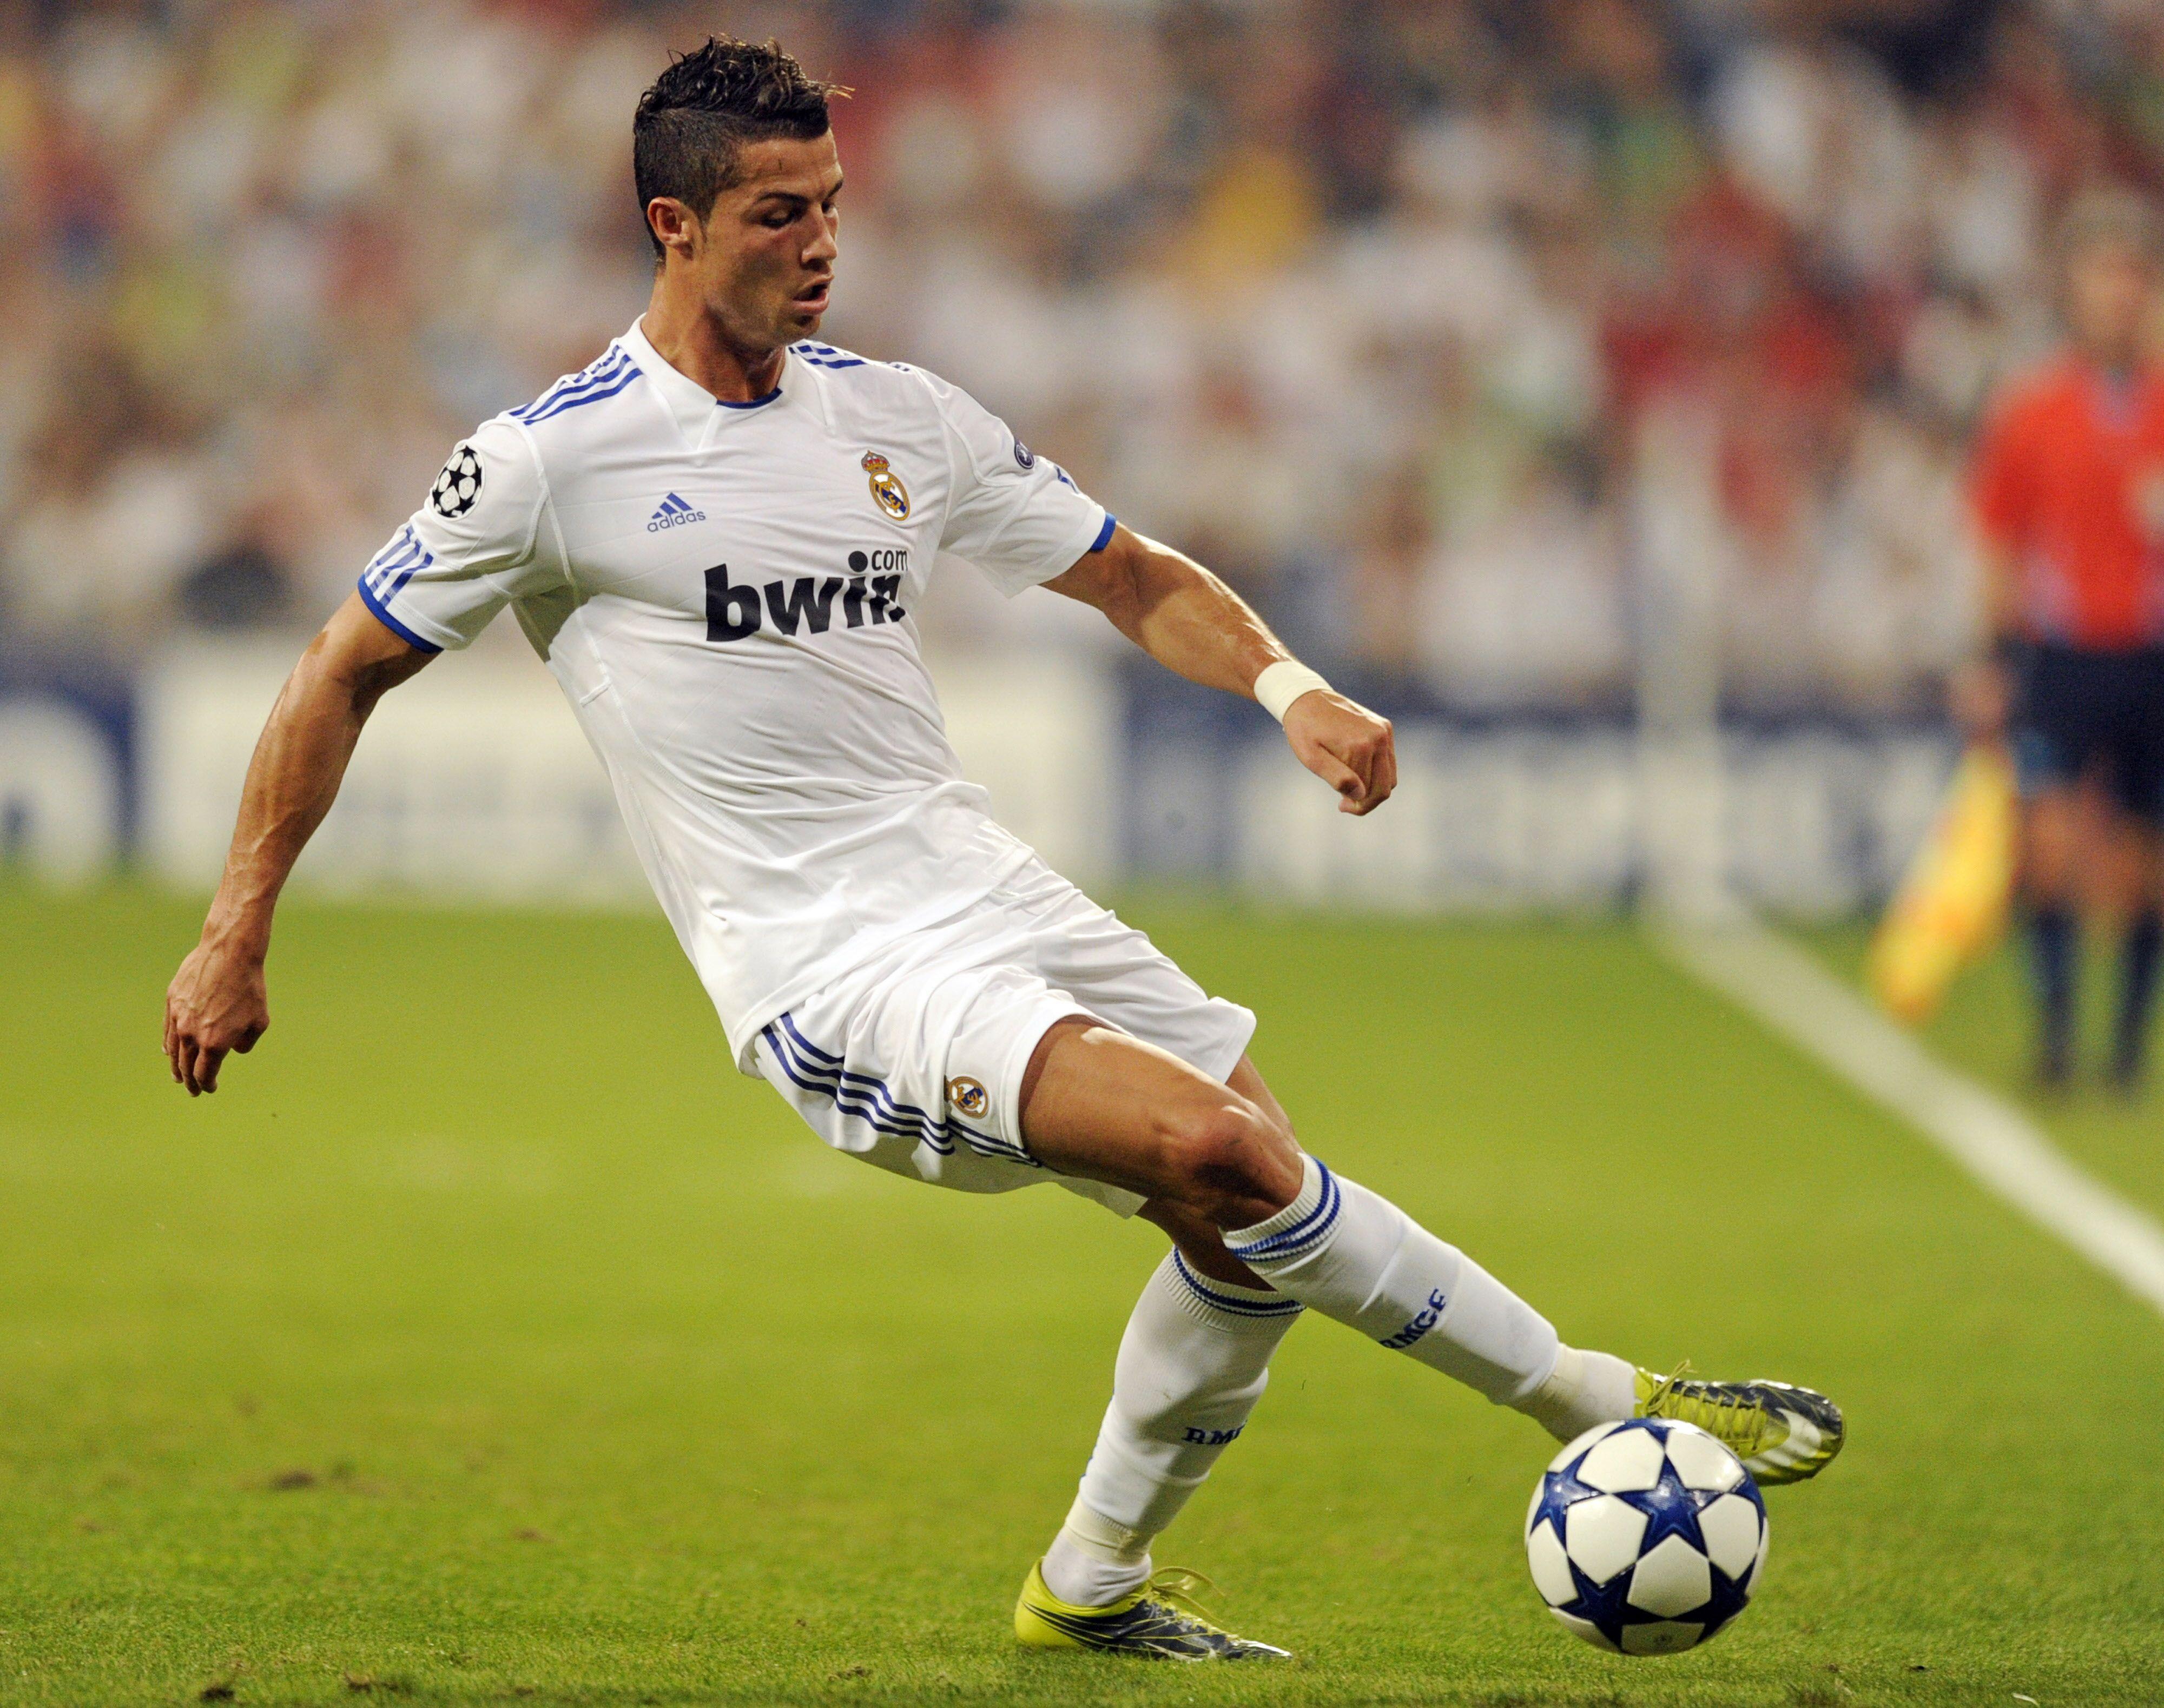 Real Madrid Wallpaper Hd Ronaldo